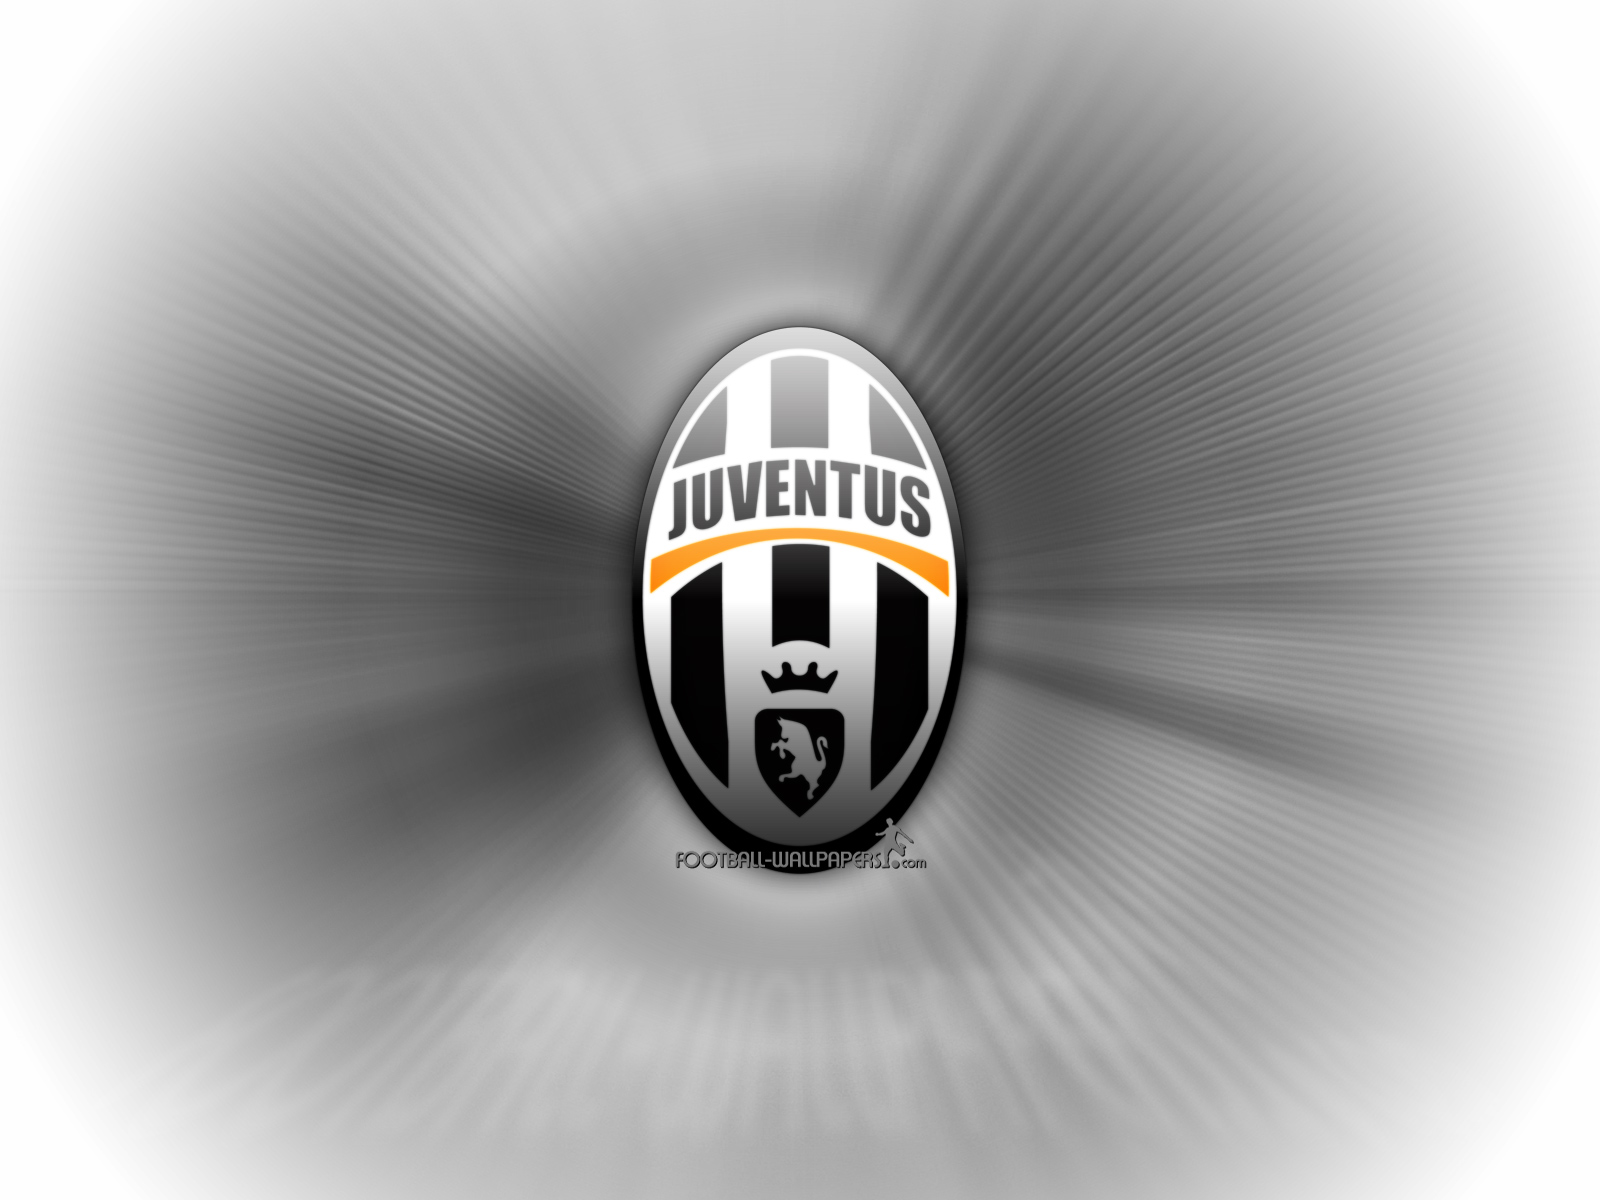 wallpapers hd for mac: Juventus Logo Wallpaper HD